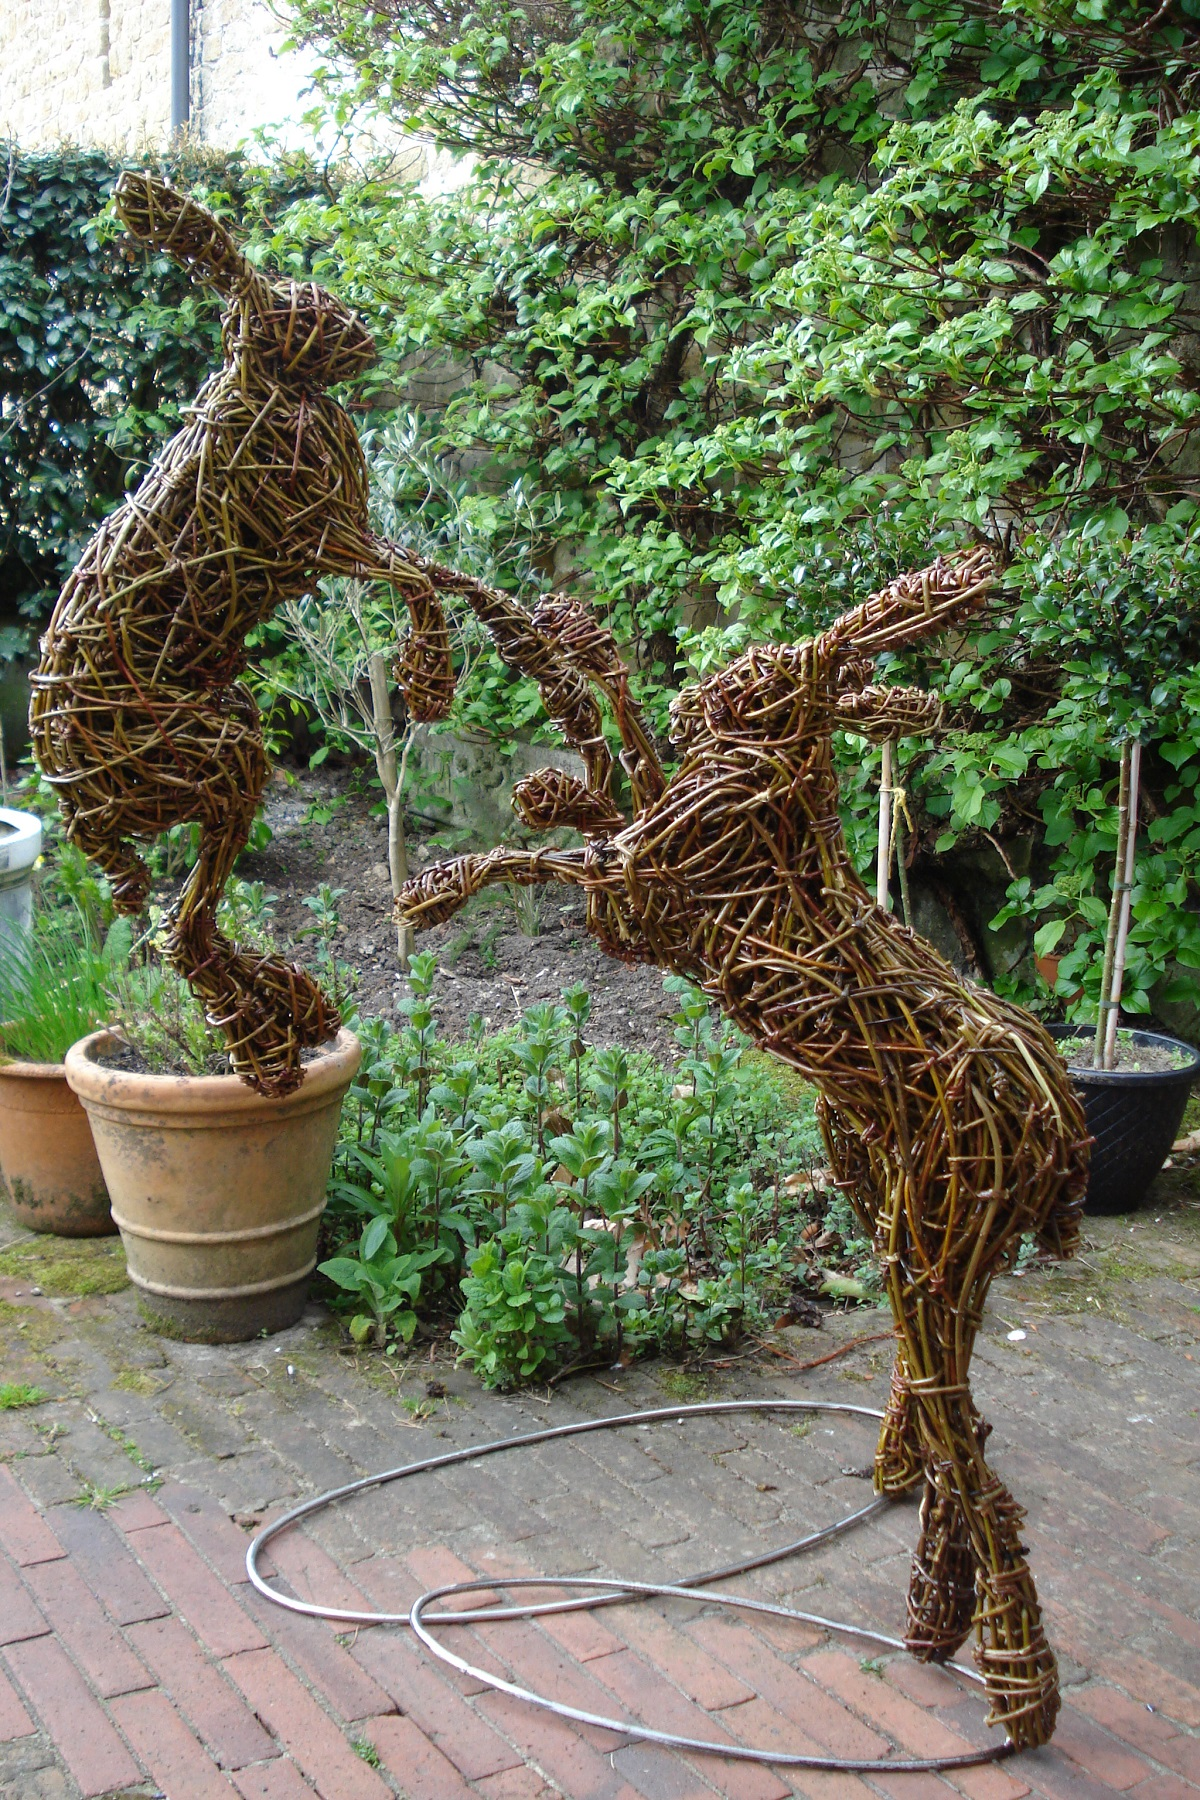 willow garden hare sculptures, metal/willow boxing hares for garden